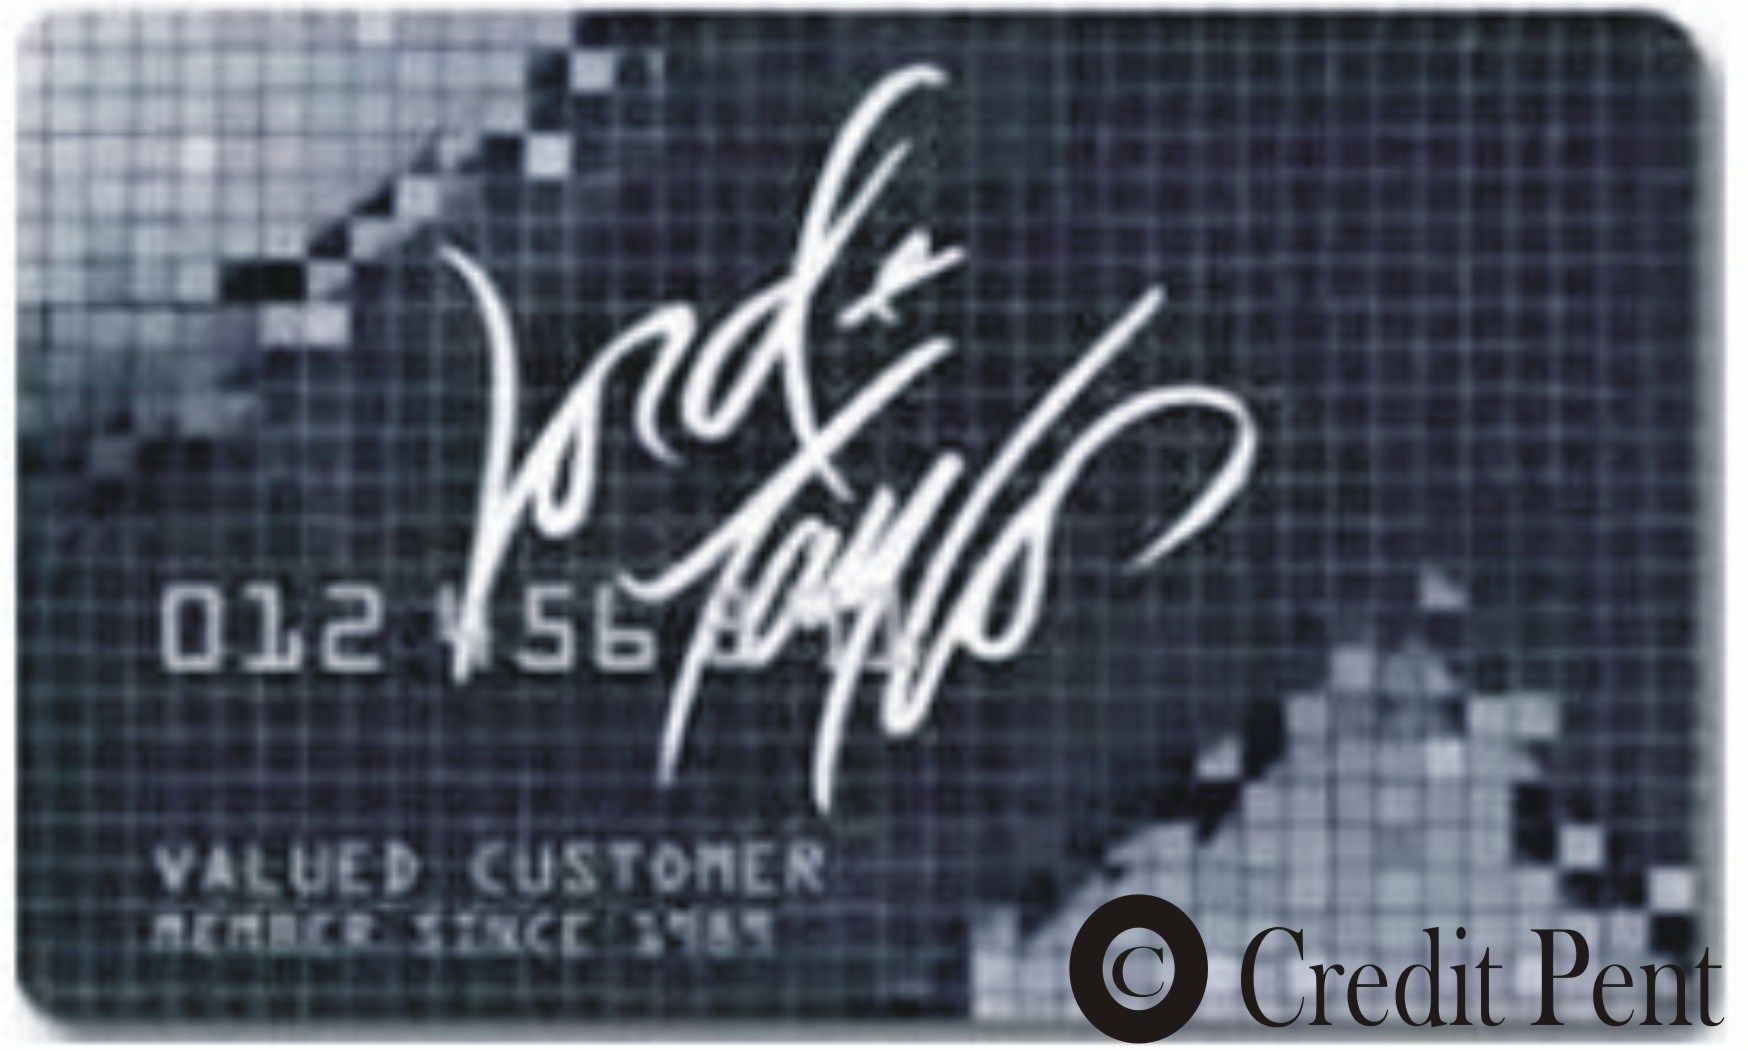 Lordandtaylor credit card login